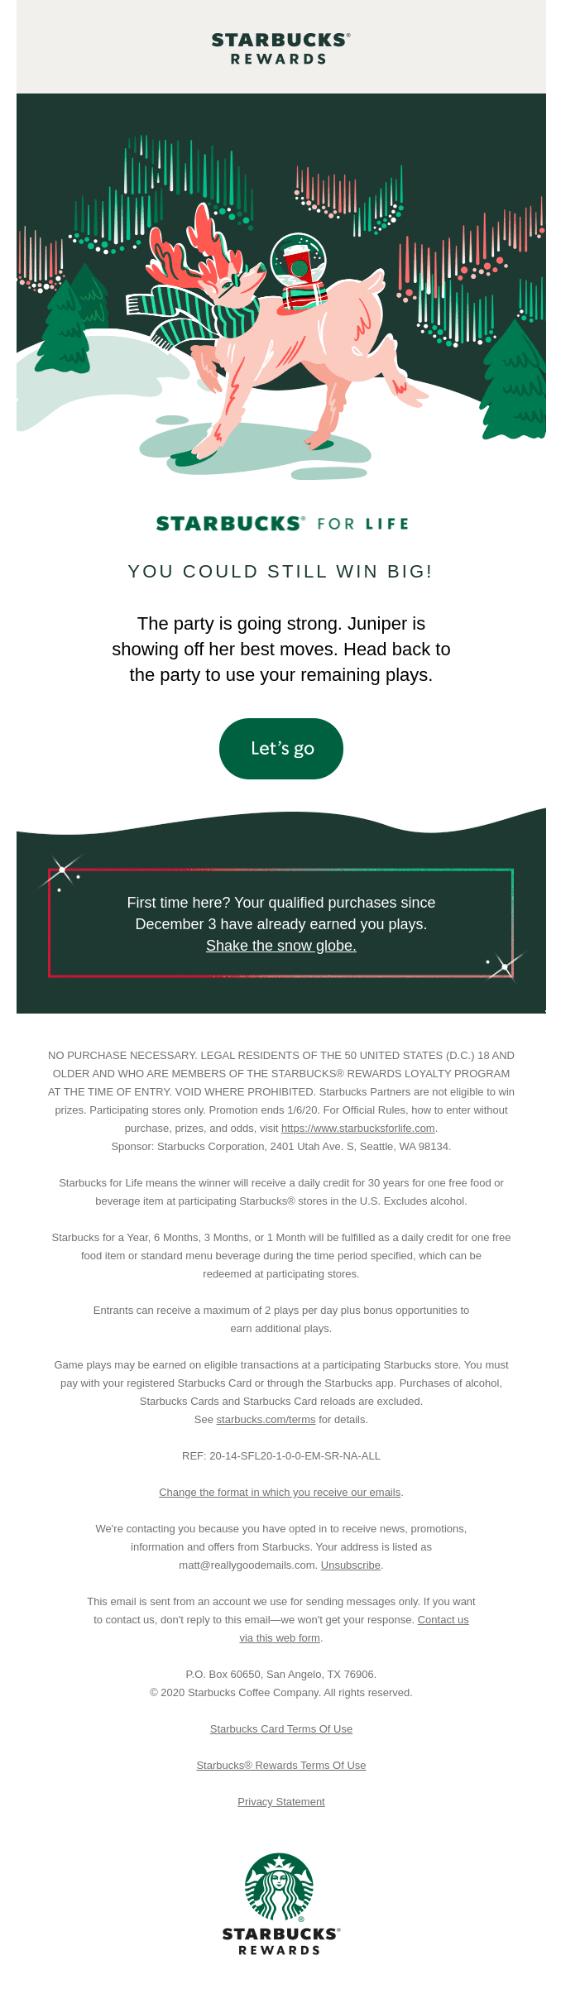 Starbucks holiday email